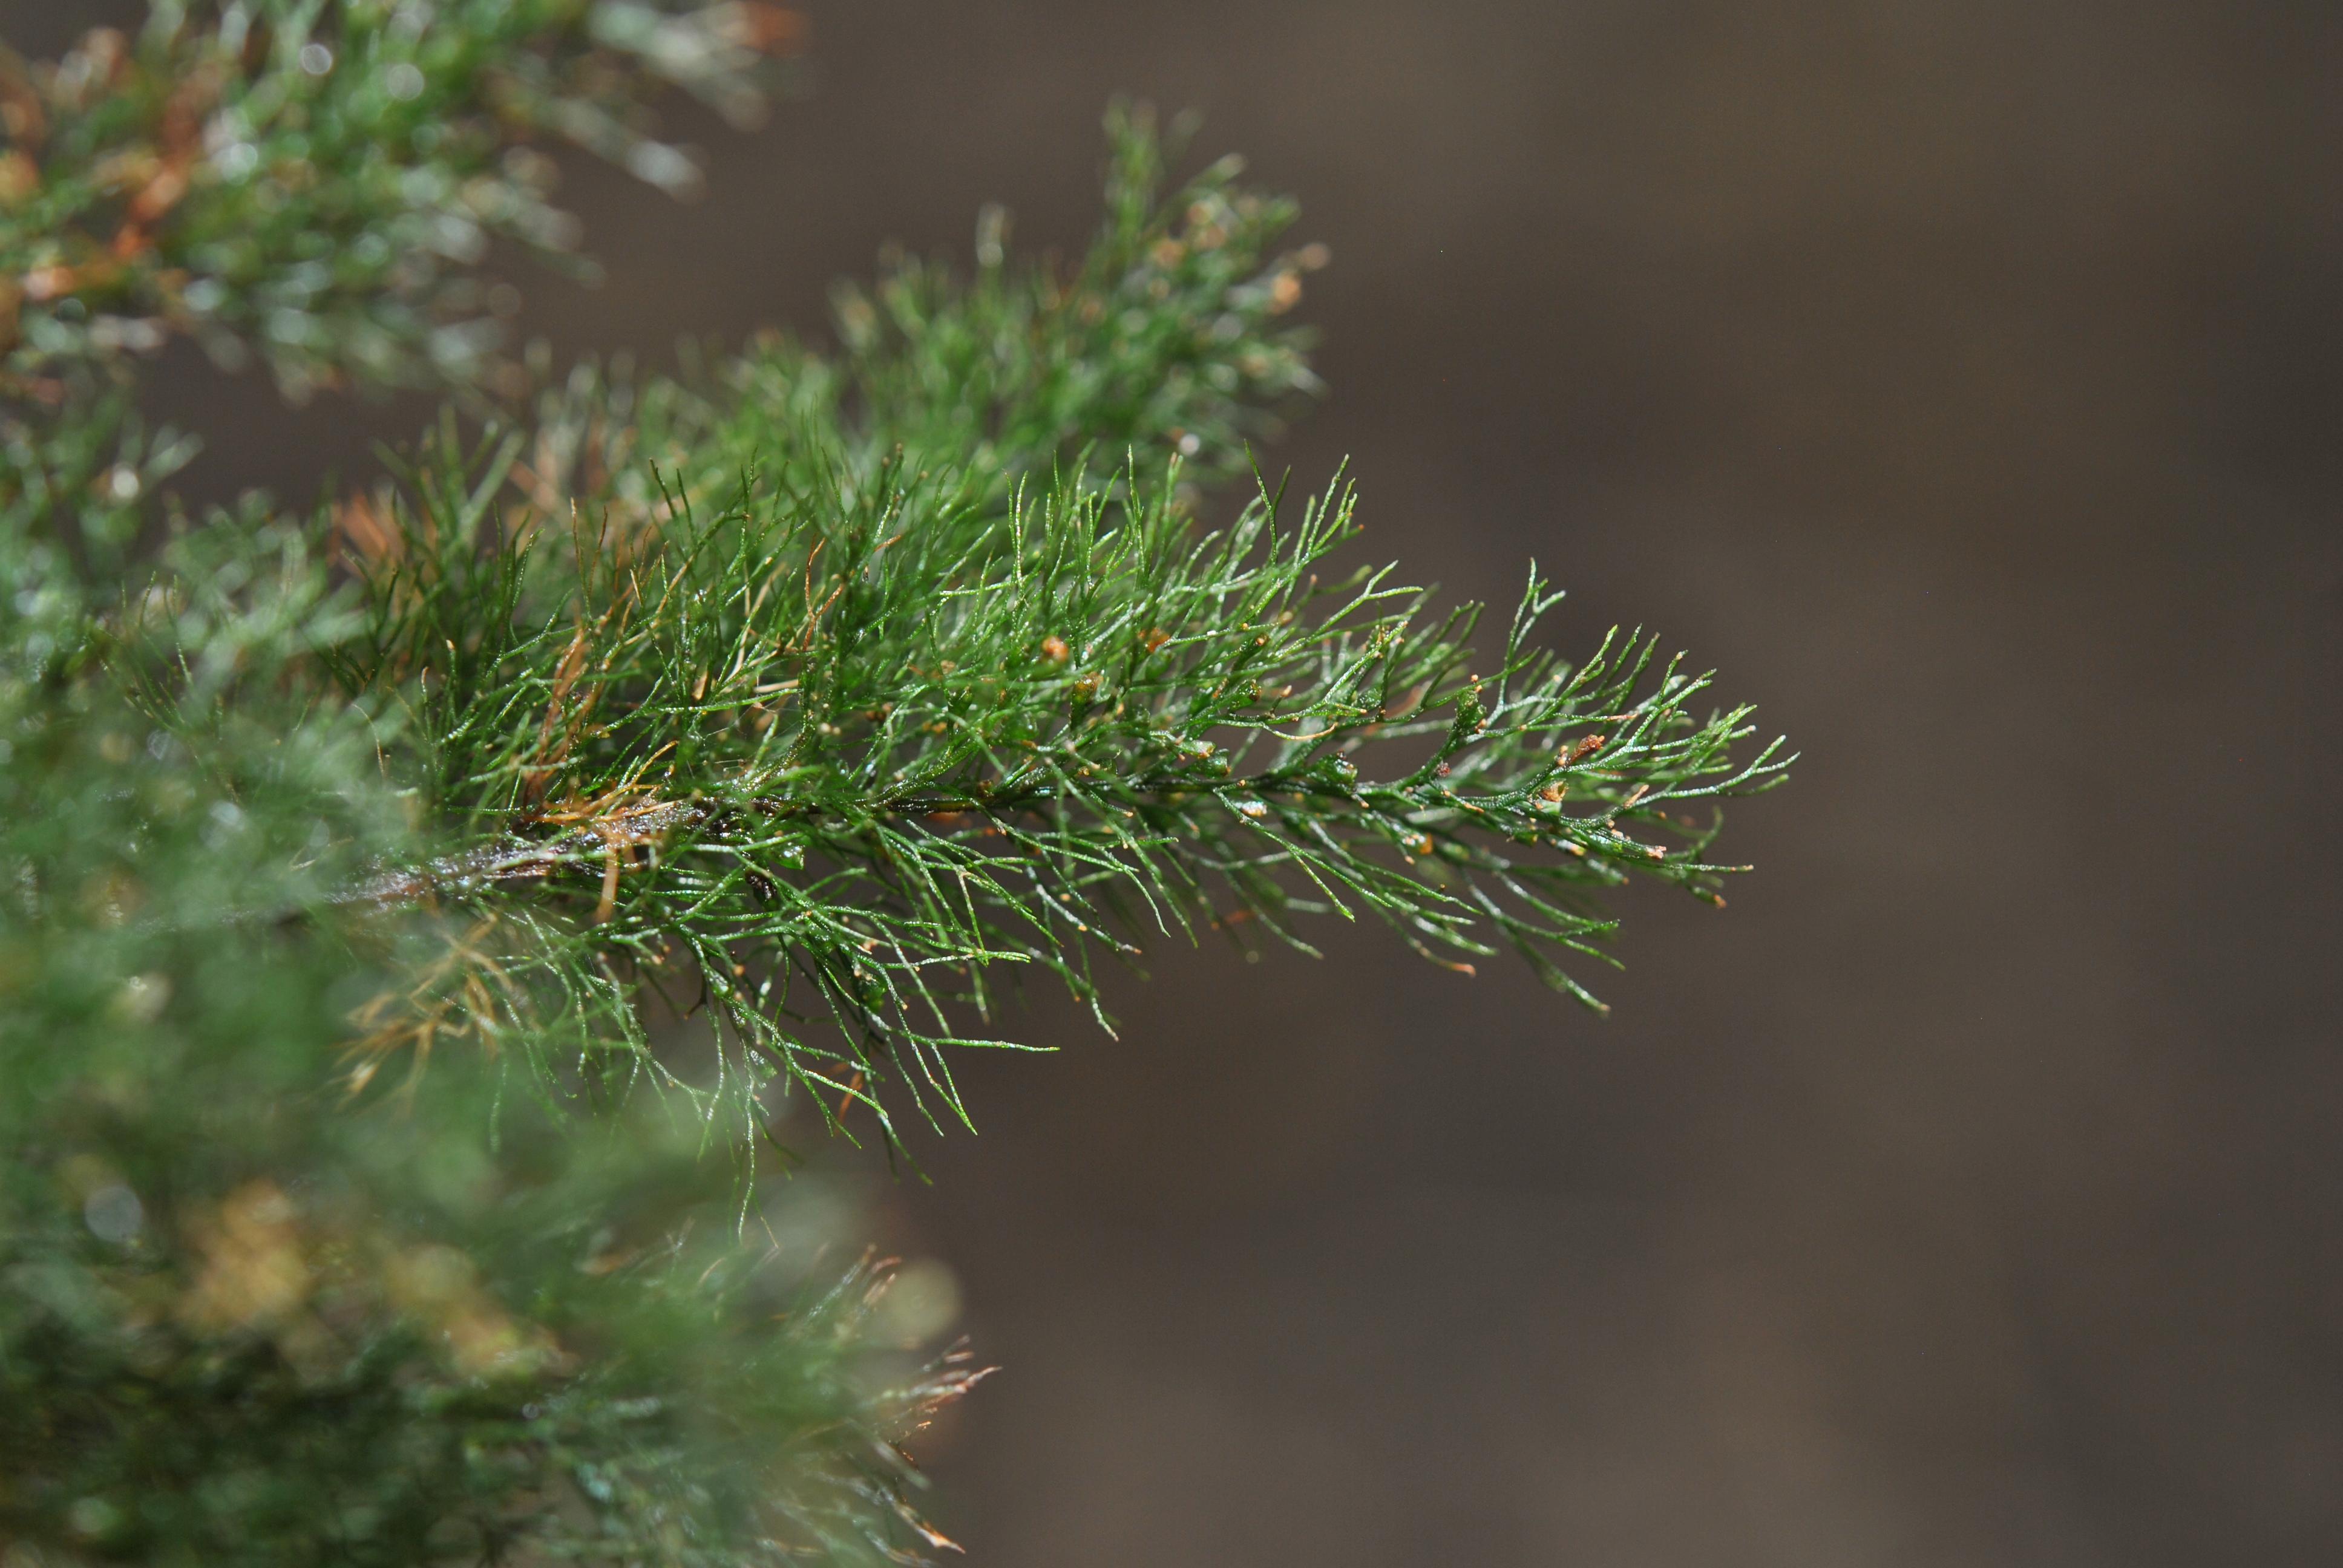 Abrodictyum pluma